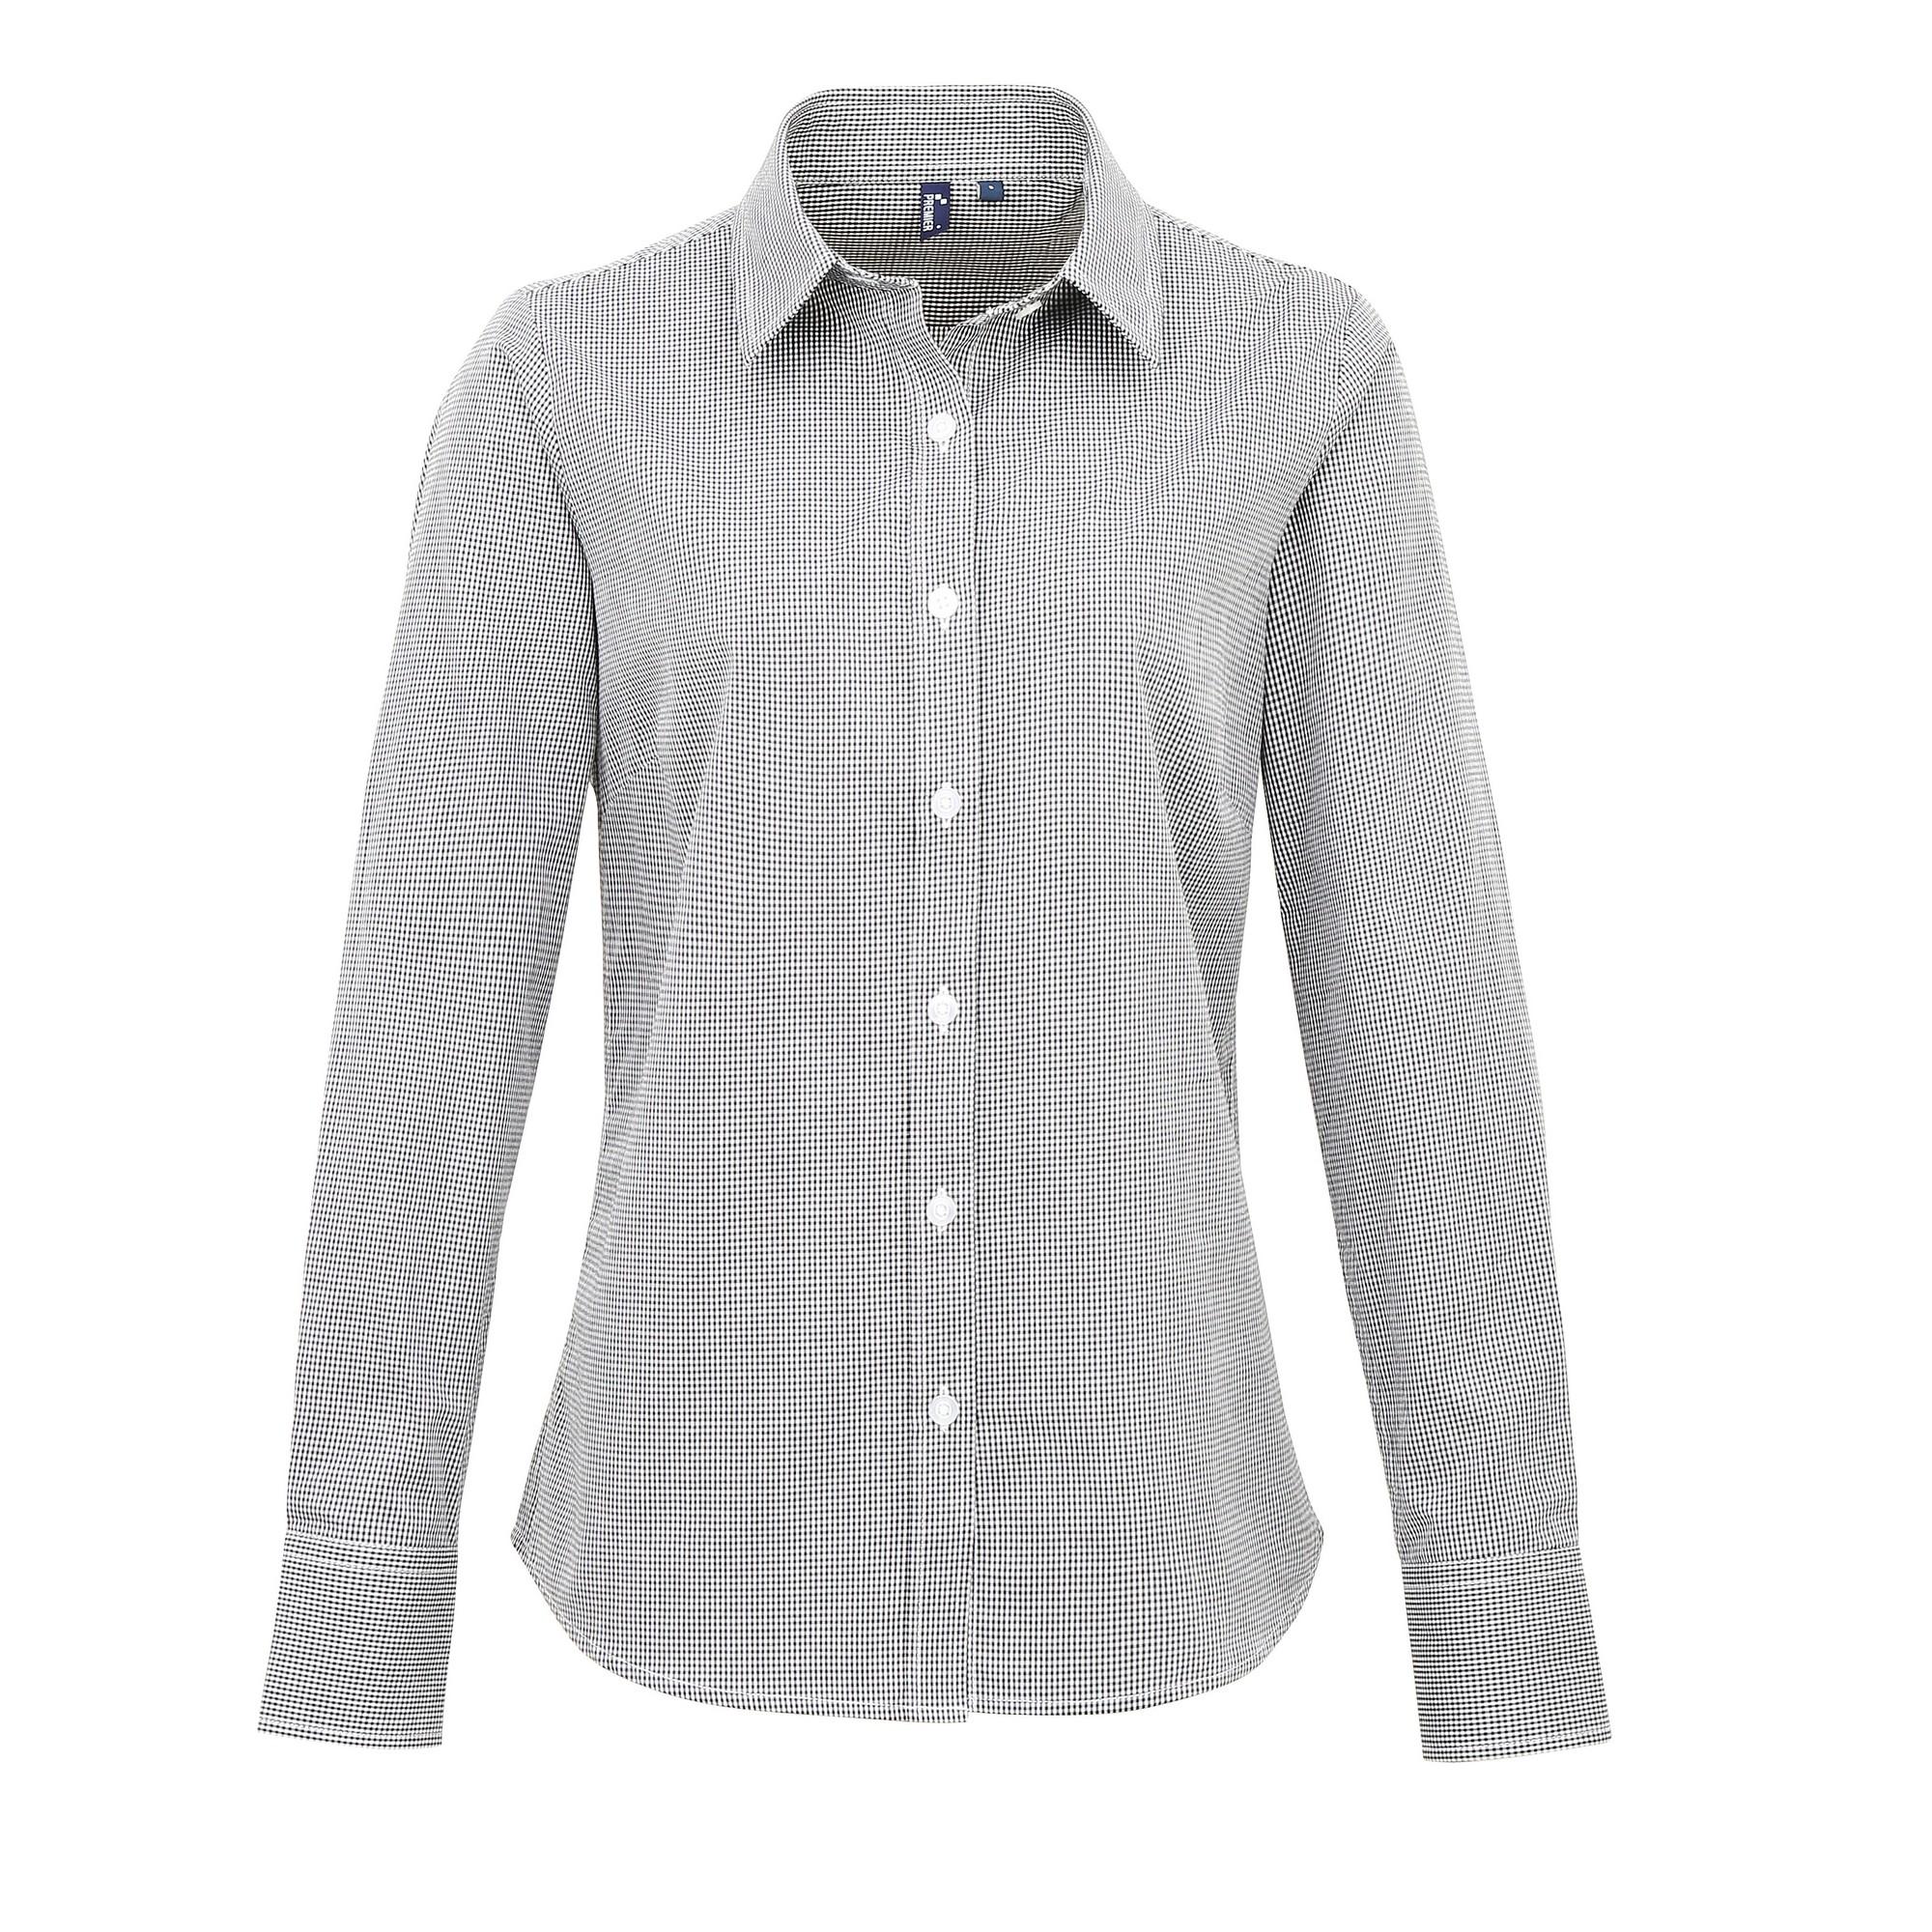 Premier Womens/Ladies Microcheck Long Sleeve Shirt (2XL) (Black/White)